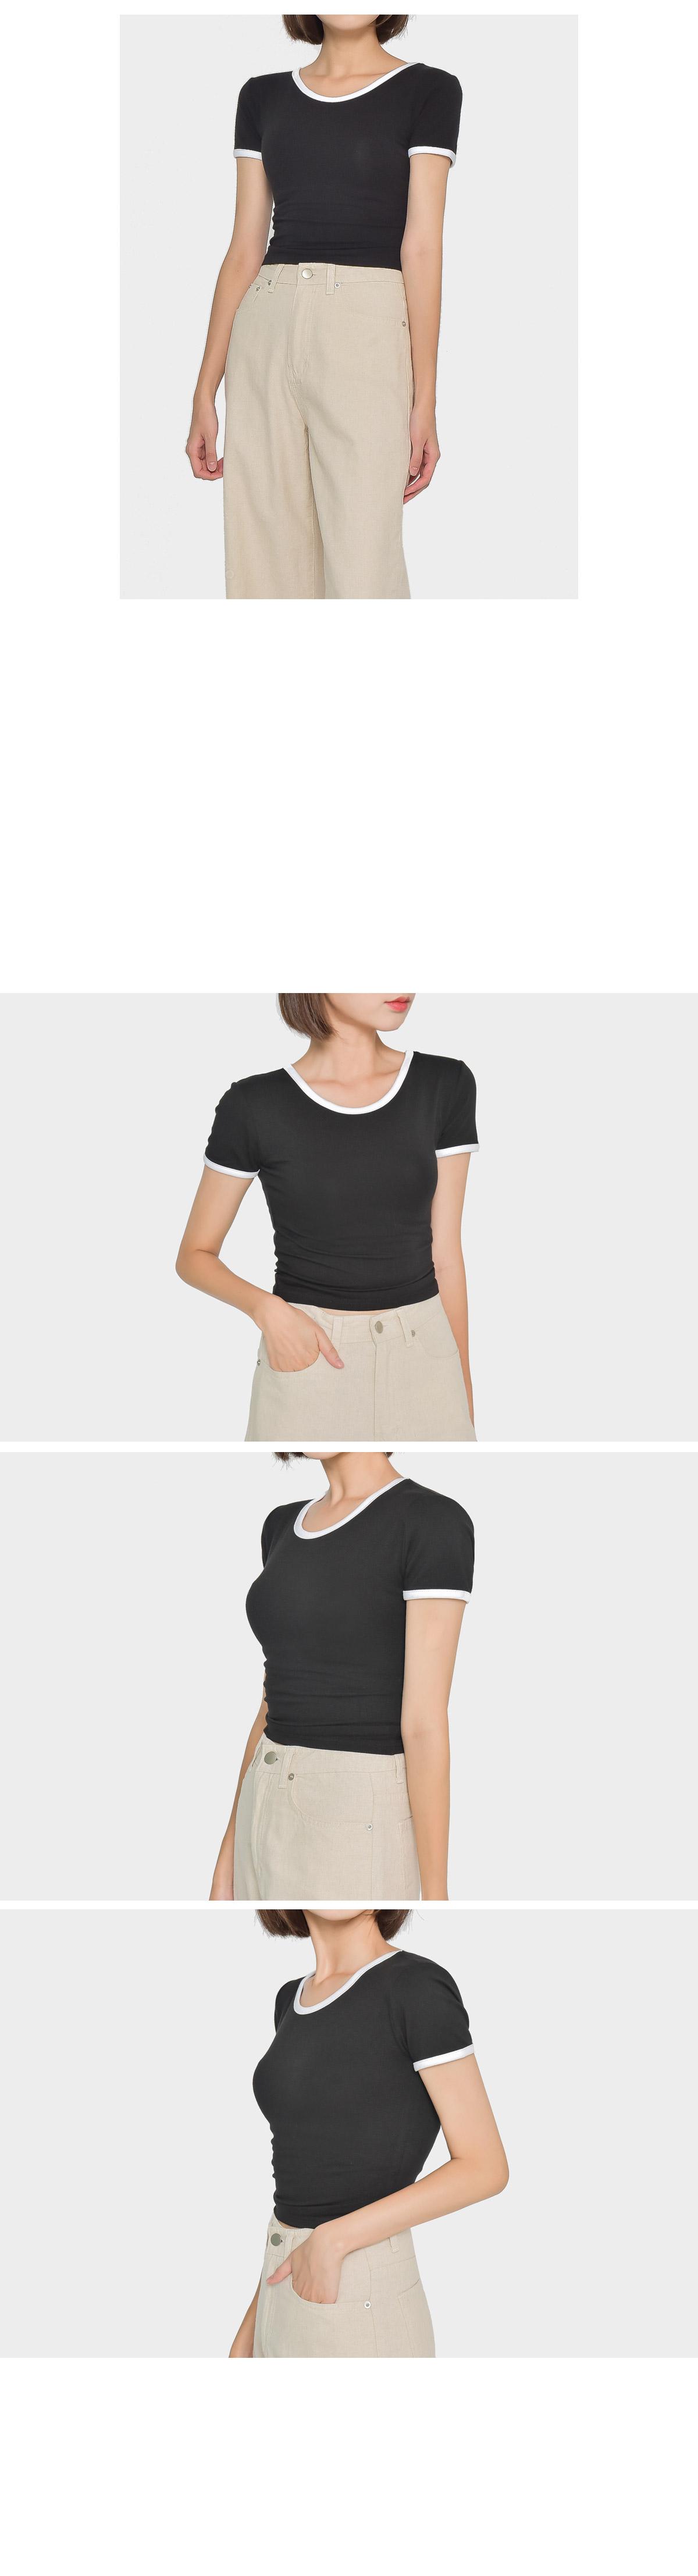 Modal cropped half t-shirt